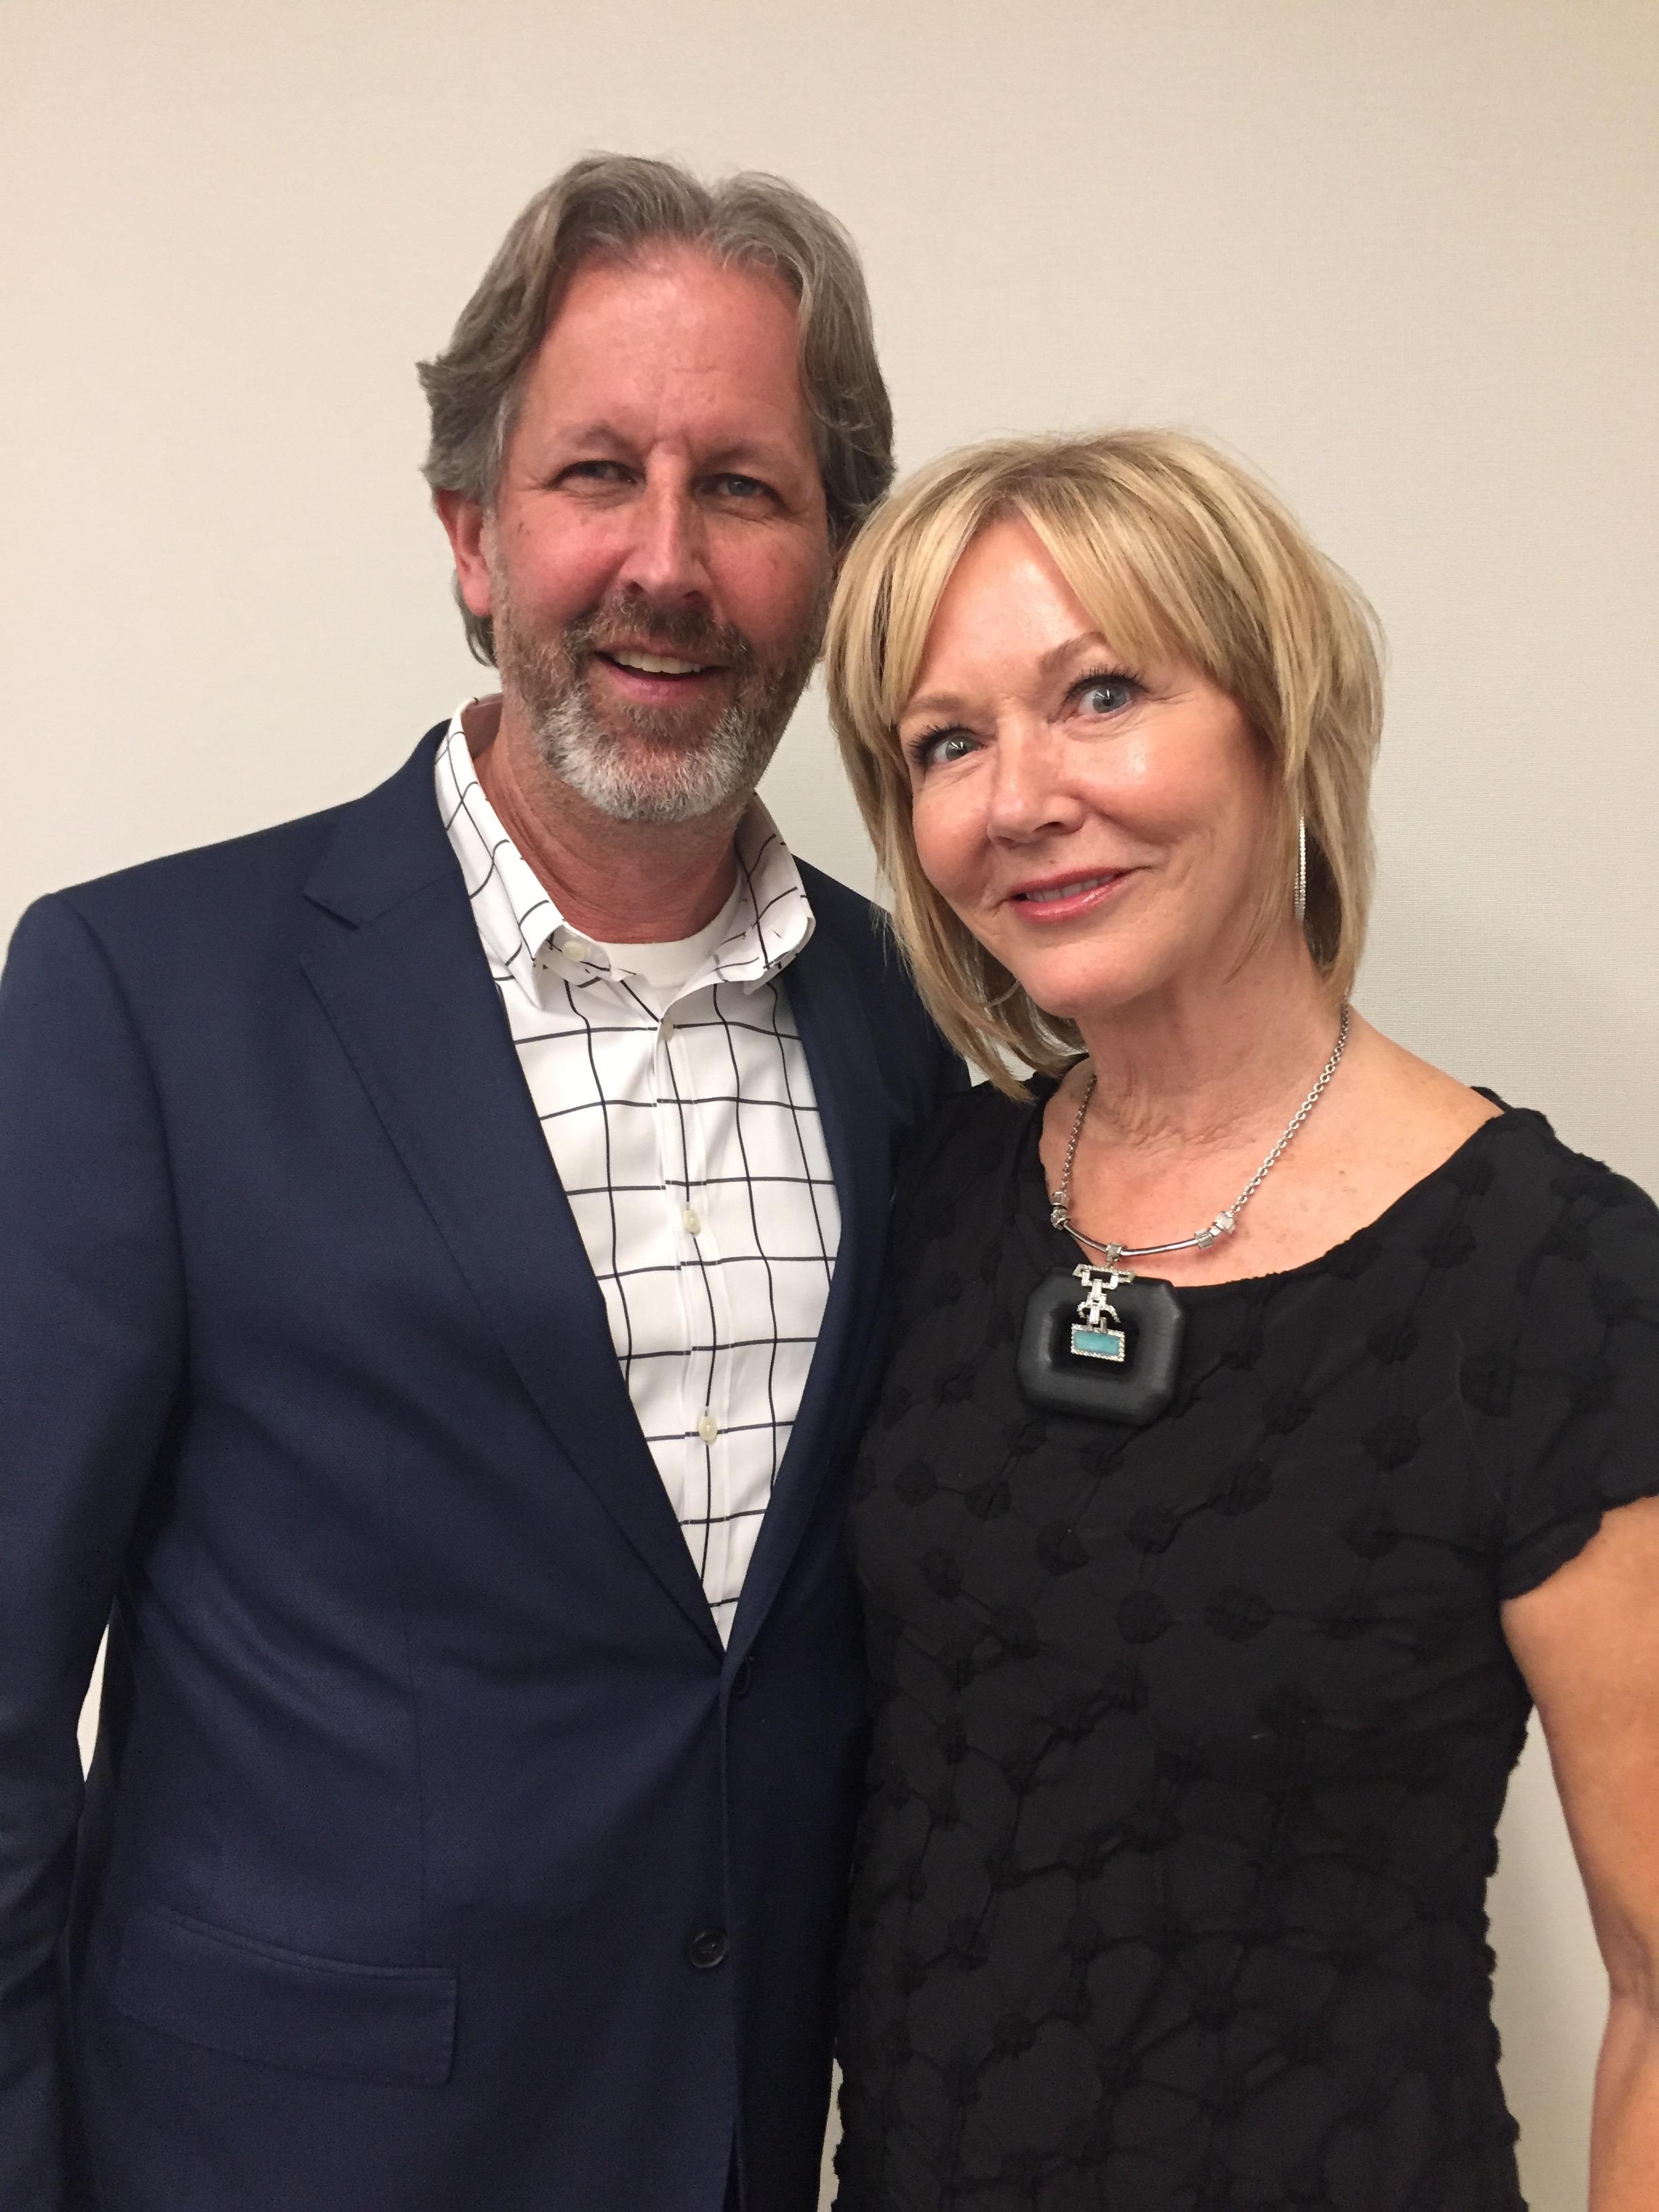 Robert Passage, Chairman and CEO of Pivot Point International, and Denise Provenzano of Zano Salons